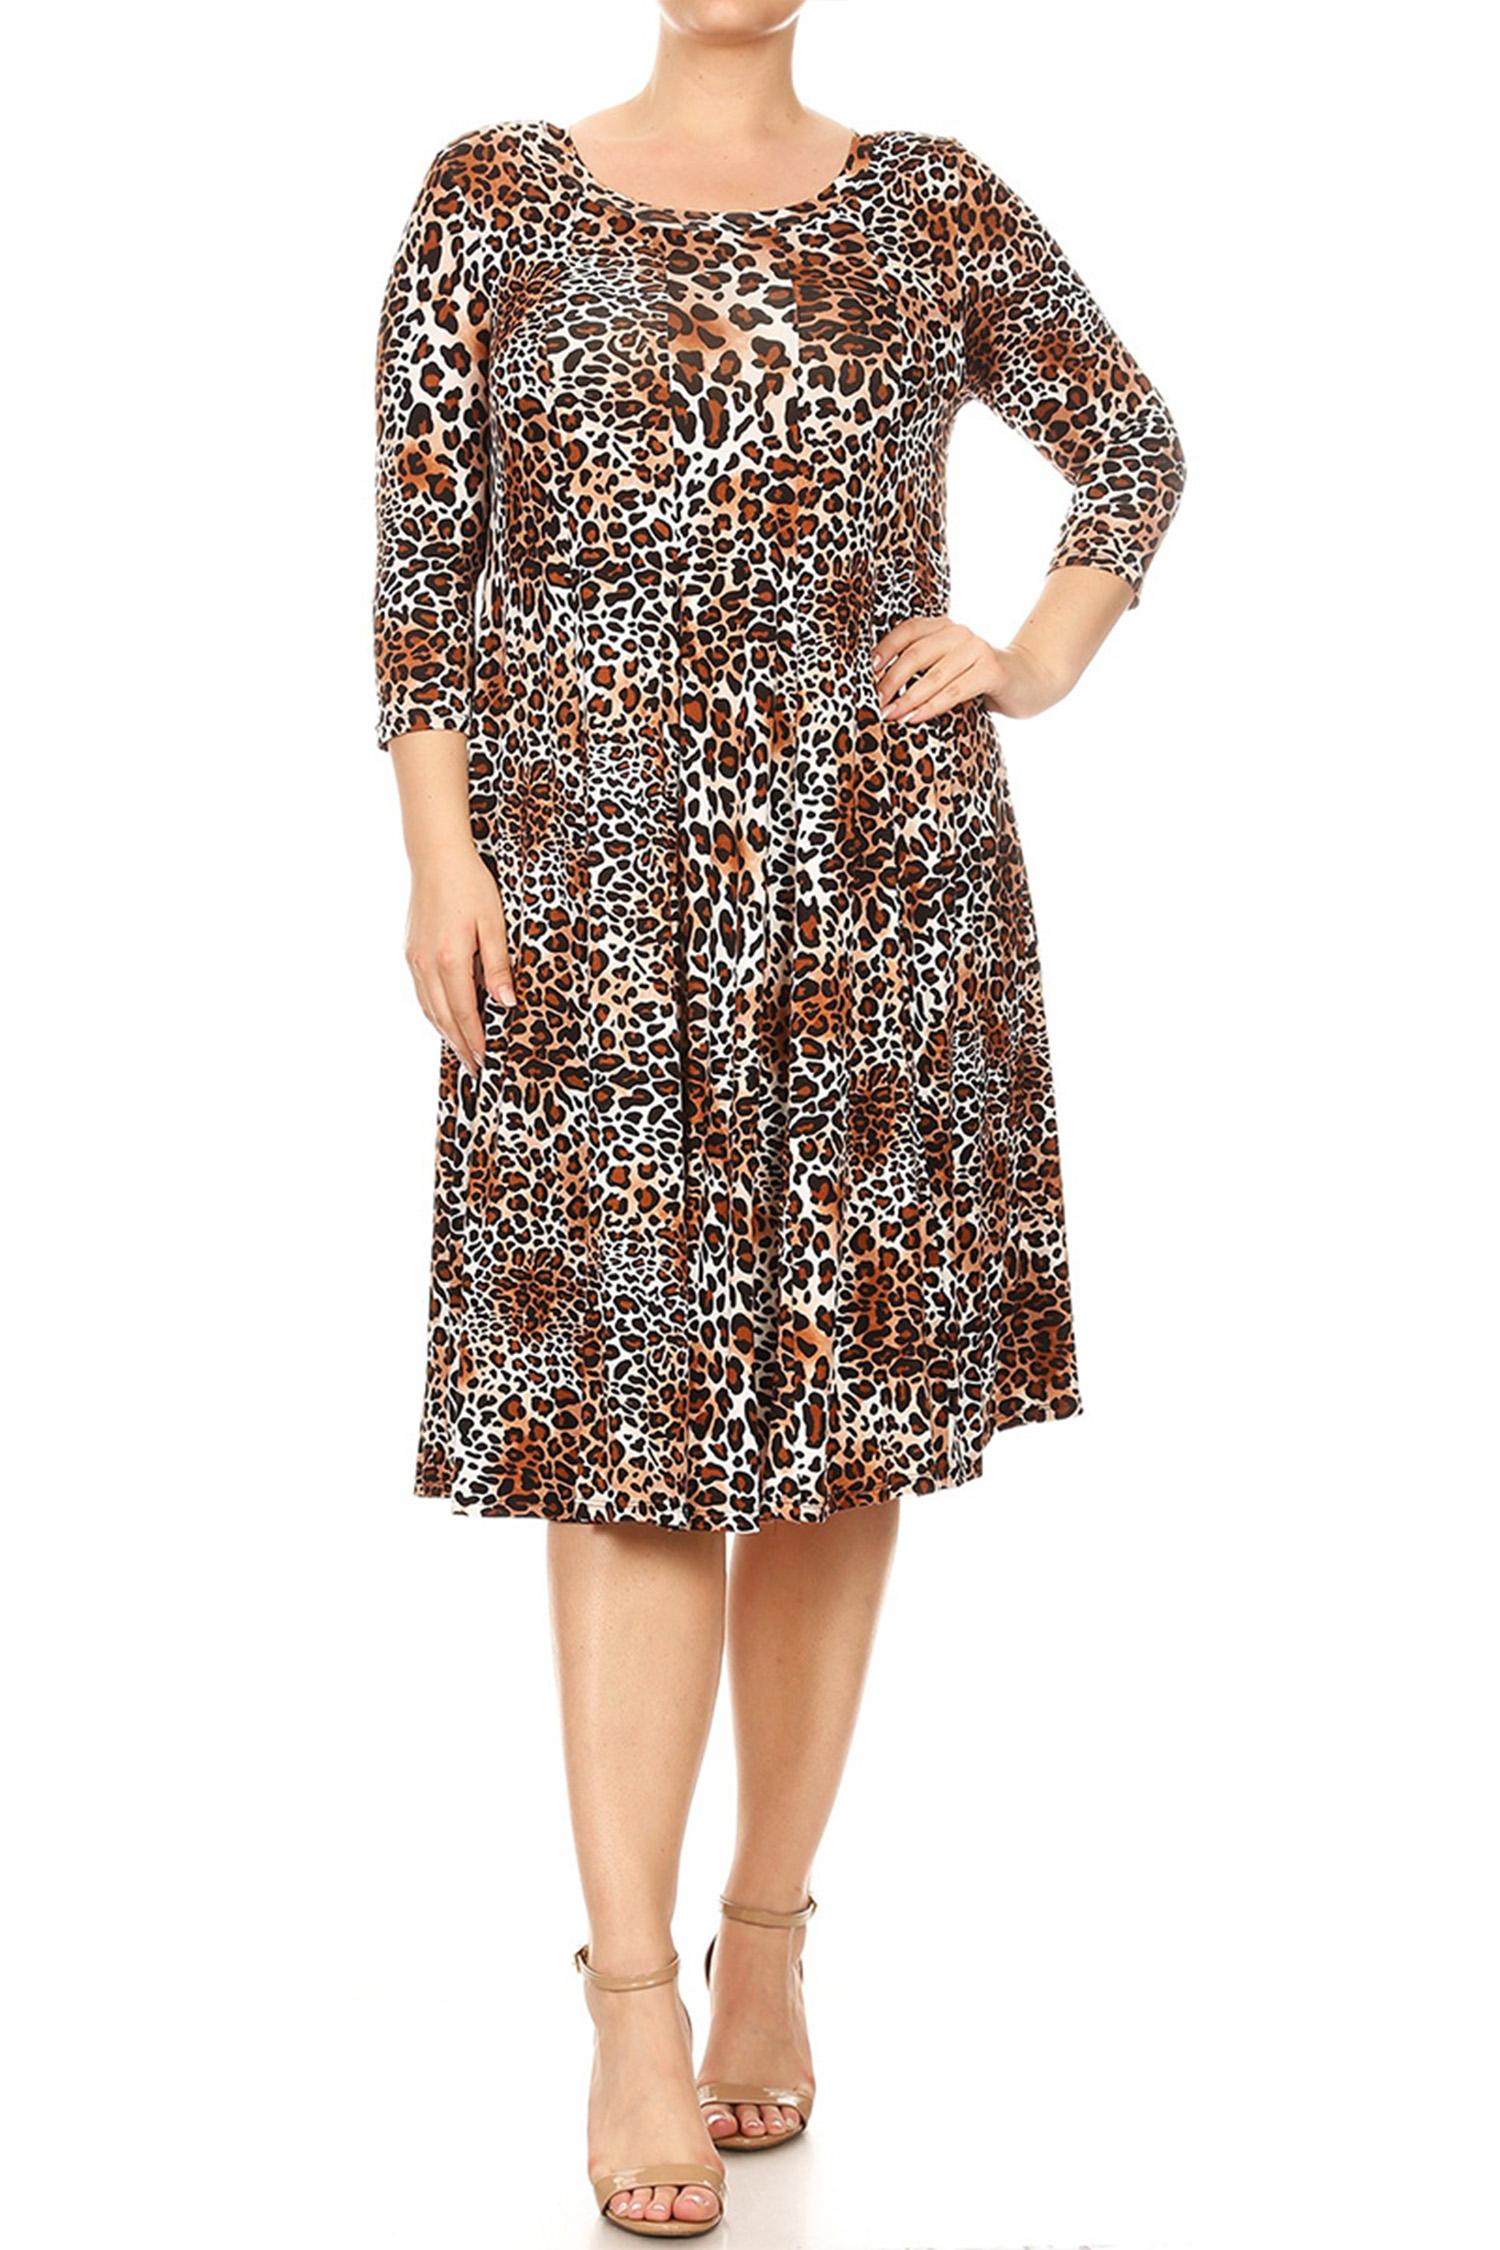 Women's Plus Size Animal Pattern Dress